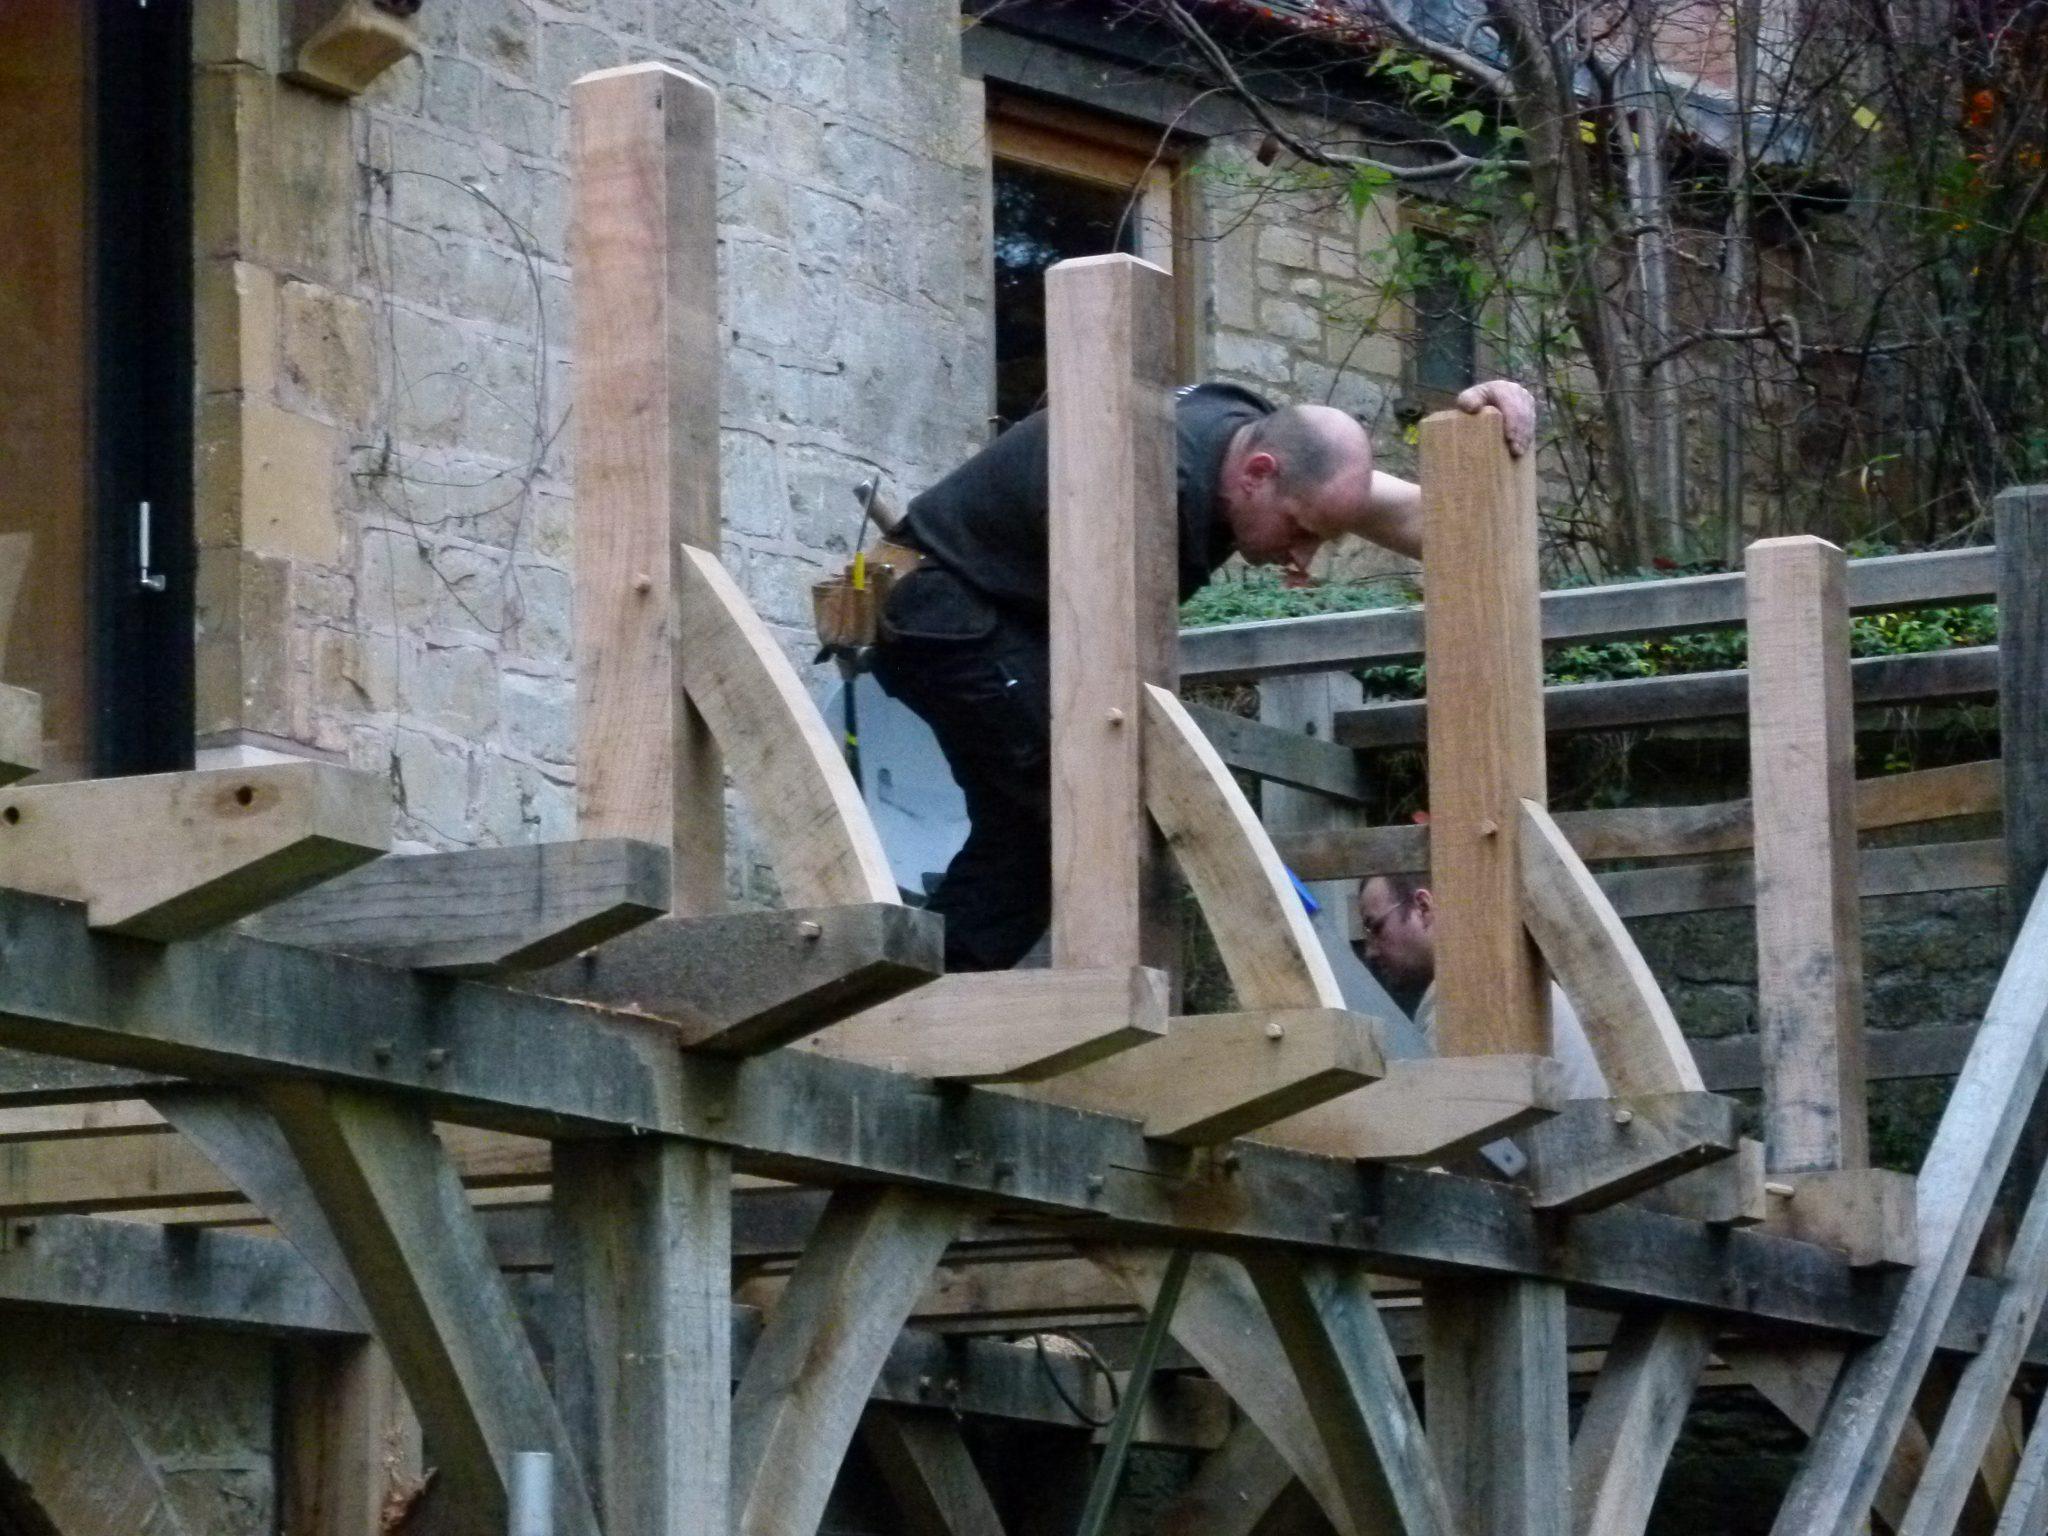 oak pergola and balcony -Turleigh - Wiltshire